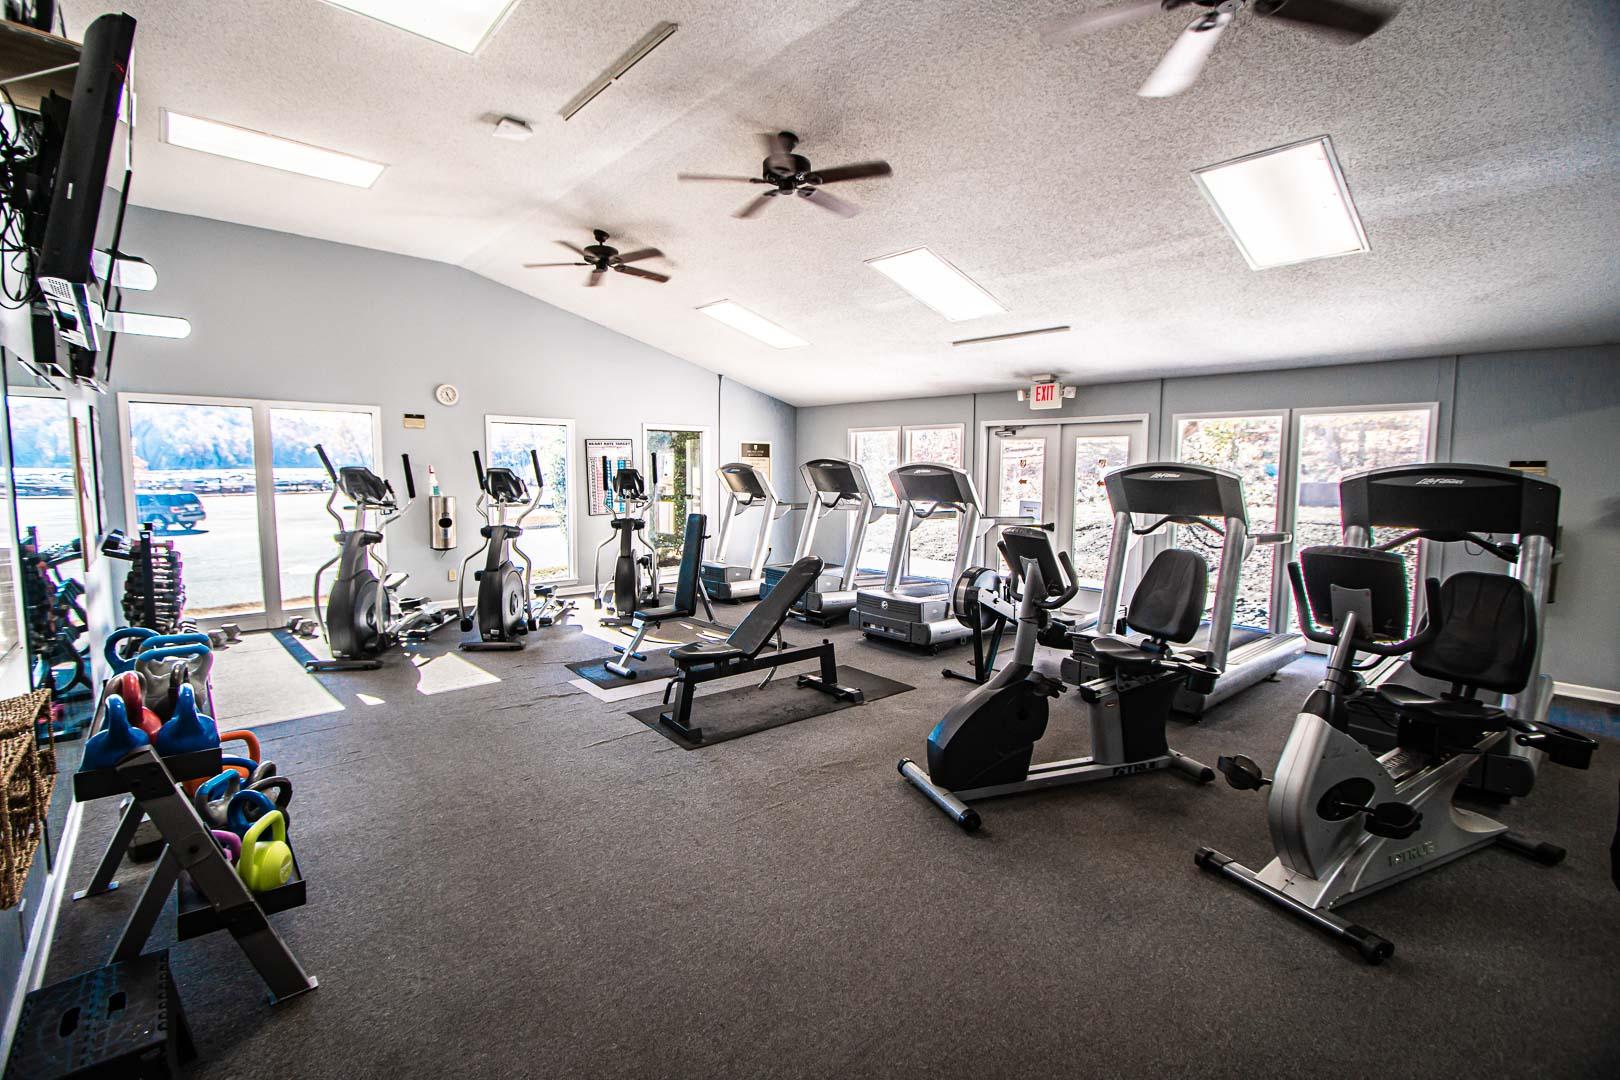 A spacious exercise room at VRI's Fox Run Resort in North Carolina.